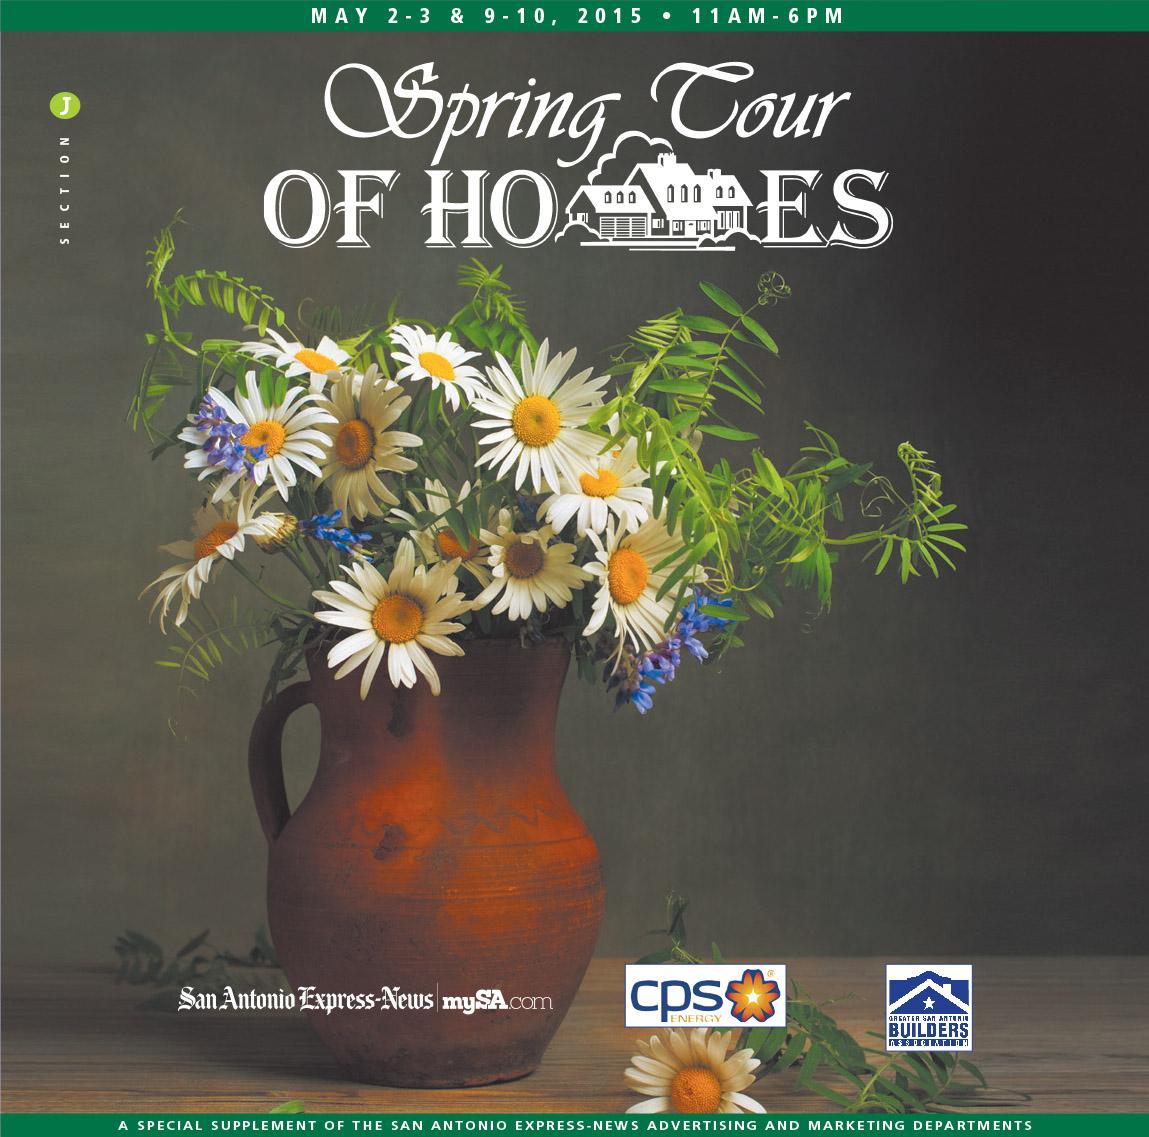 2015 Spring Tour of Homes - San Antonio & Boerne